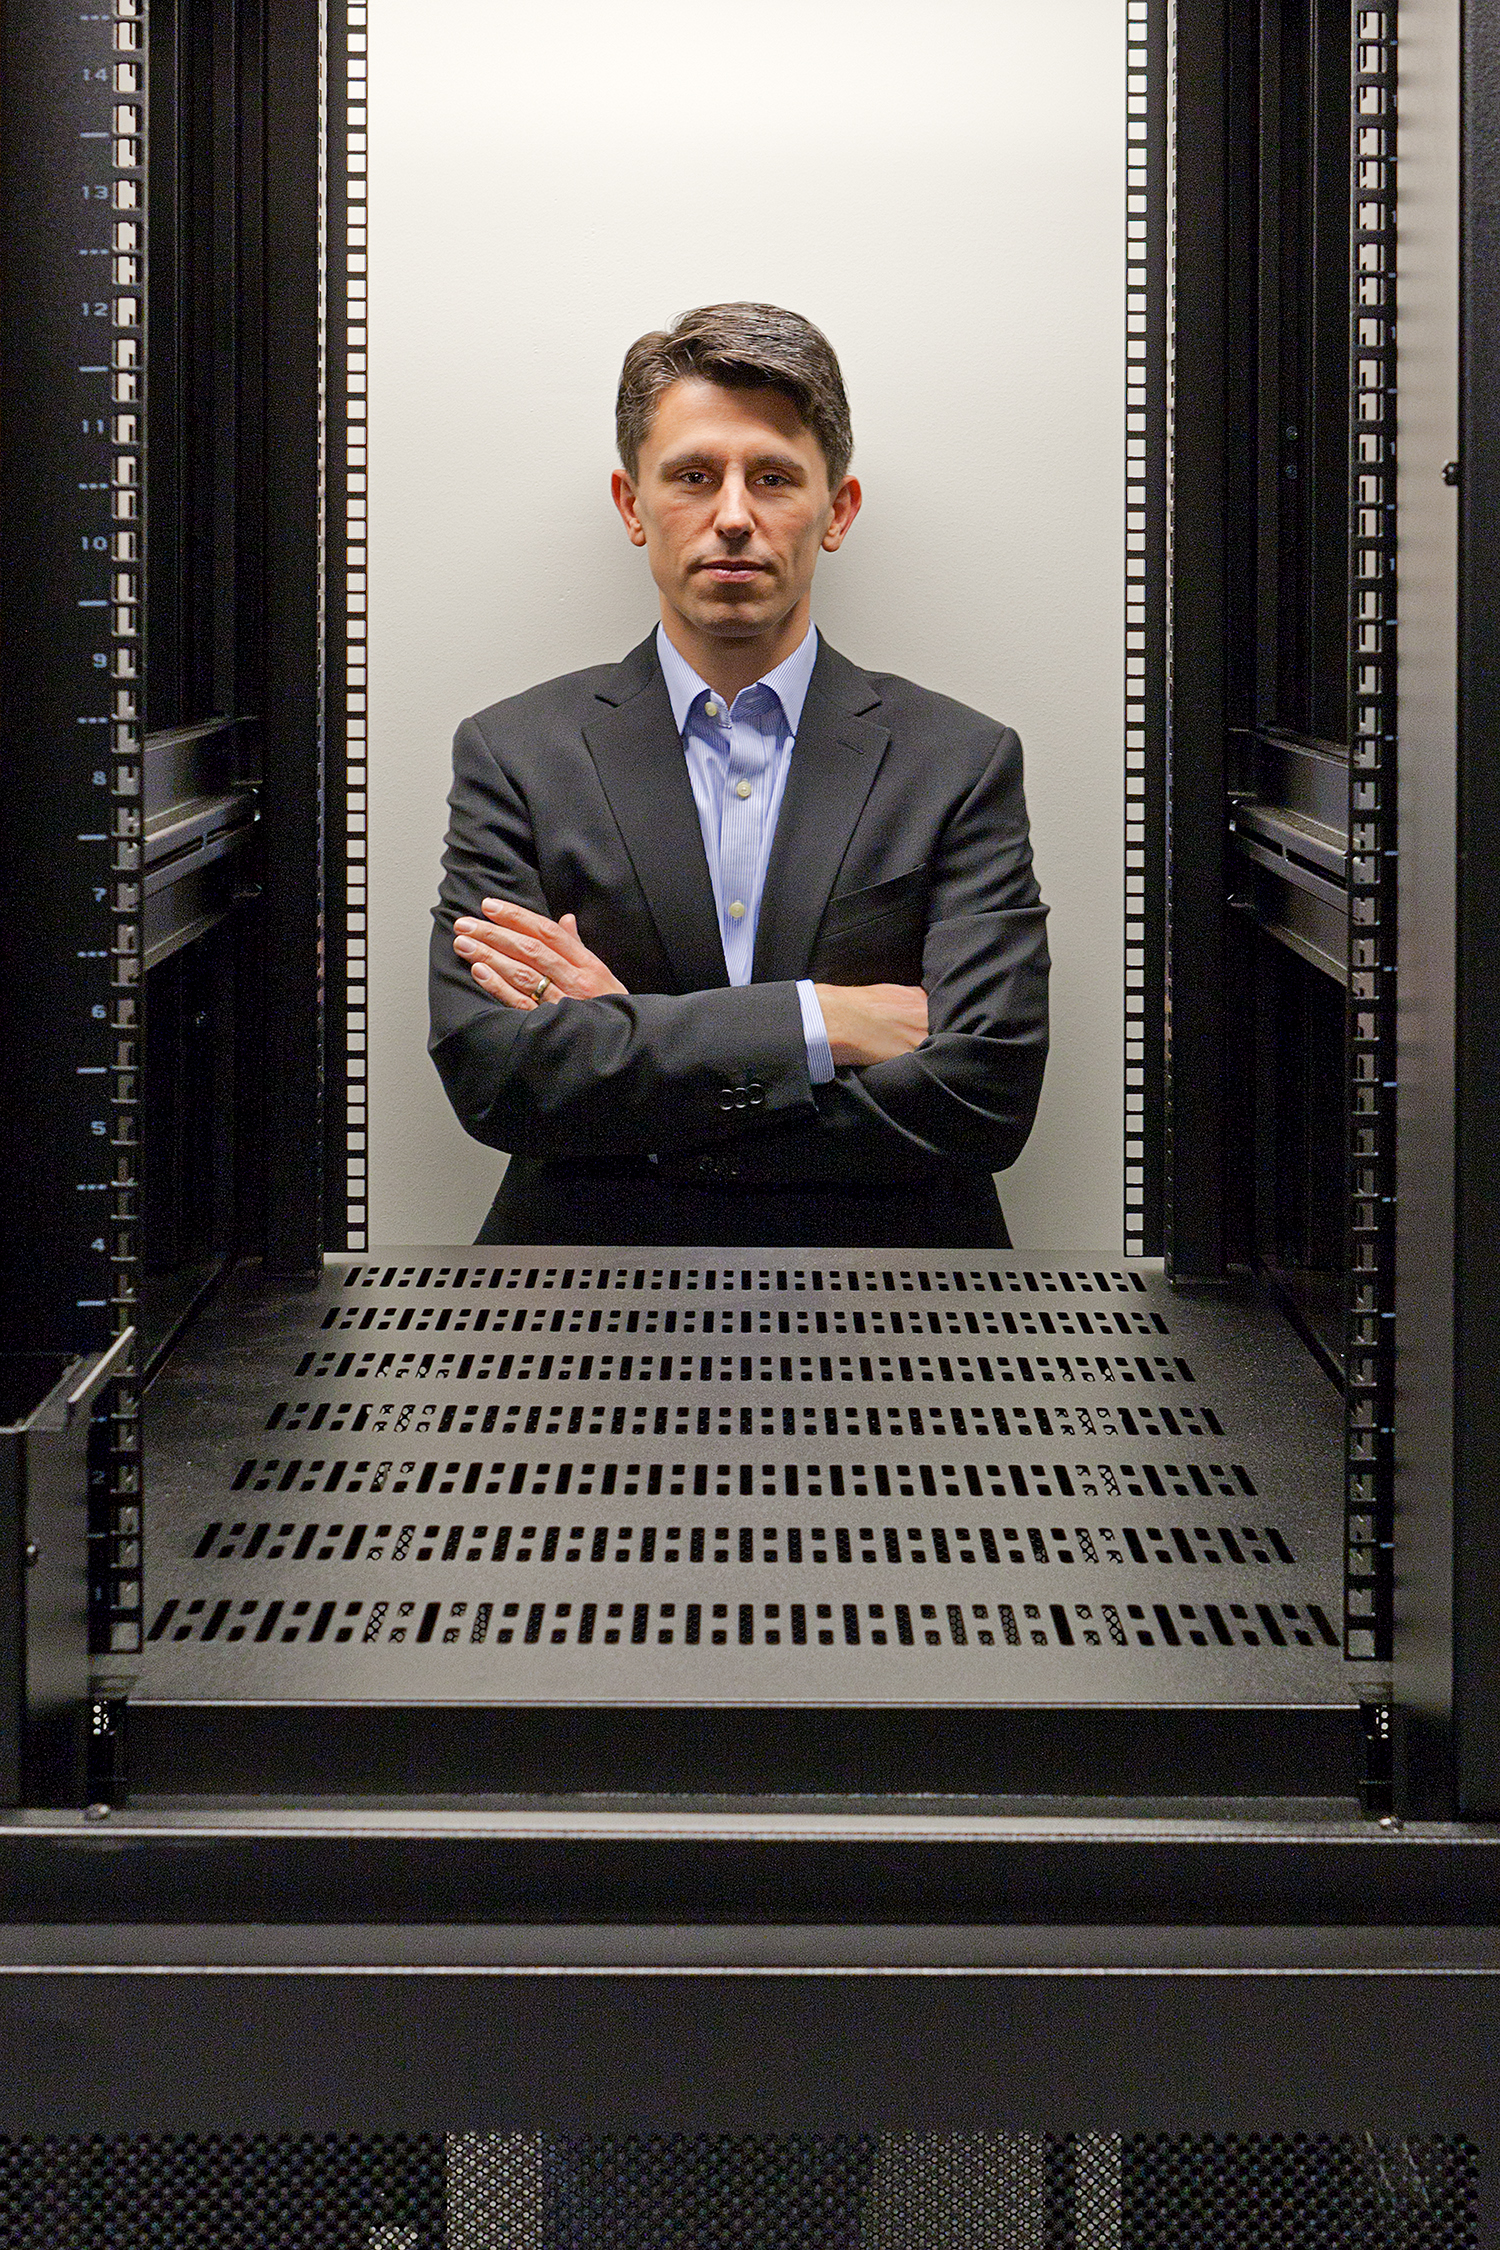 Matthew Porter / Chief Executive / Contegix / St. Louis MO / For the New York Times